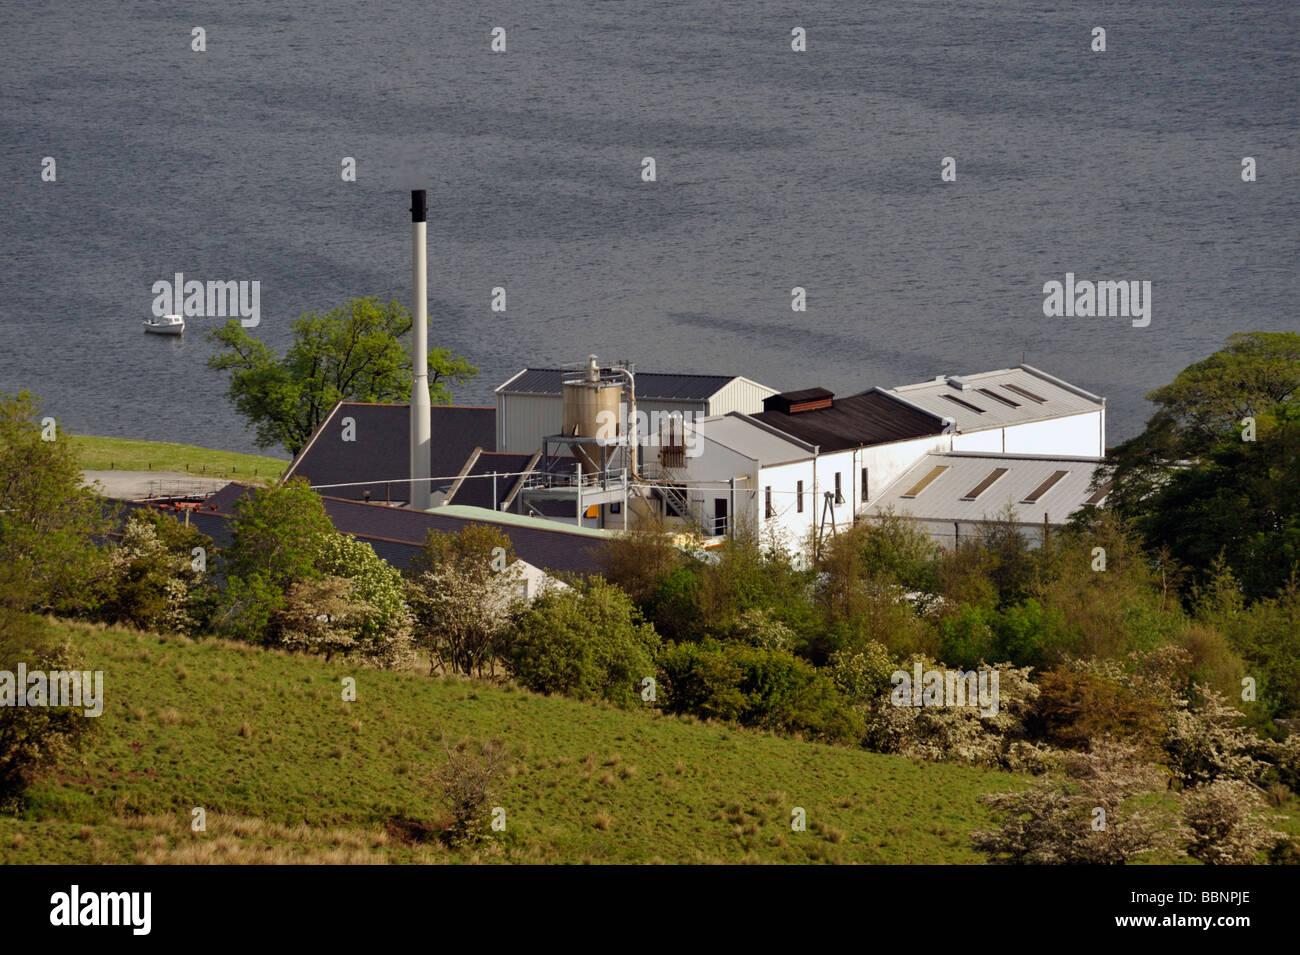 Talisker whisky distillery. Carbost, Loch Harport, Minginish, Isle of Skye, Inner Hebrides, Scotland, United Kingdom, Europe. Stock Photo